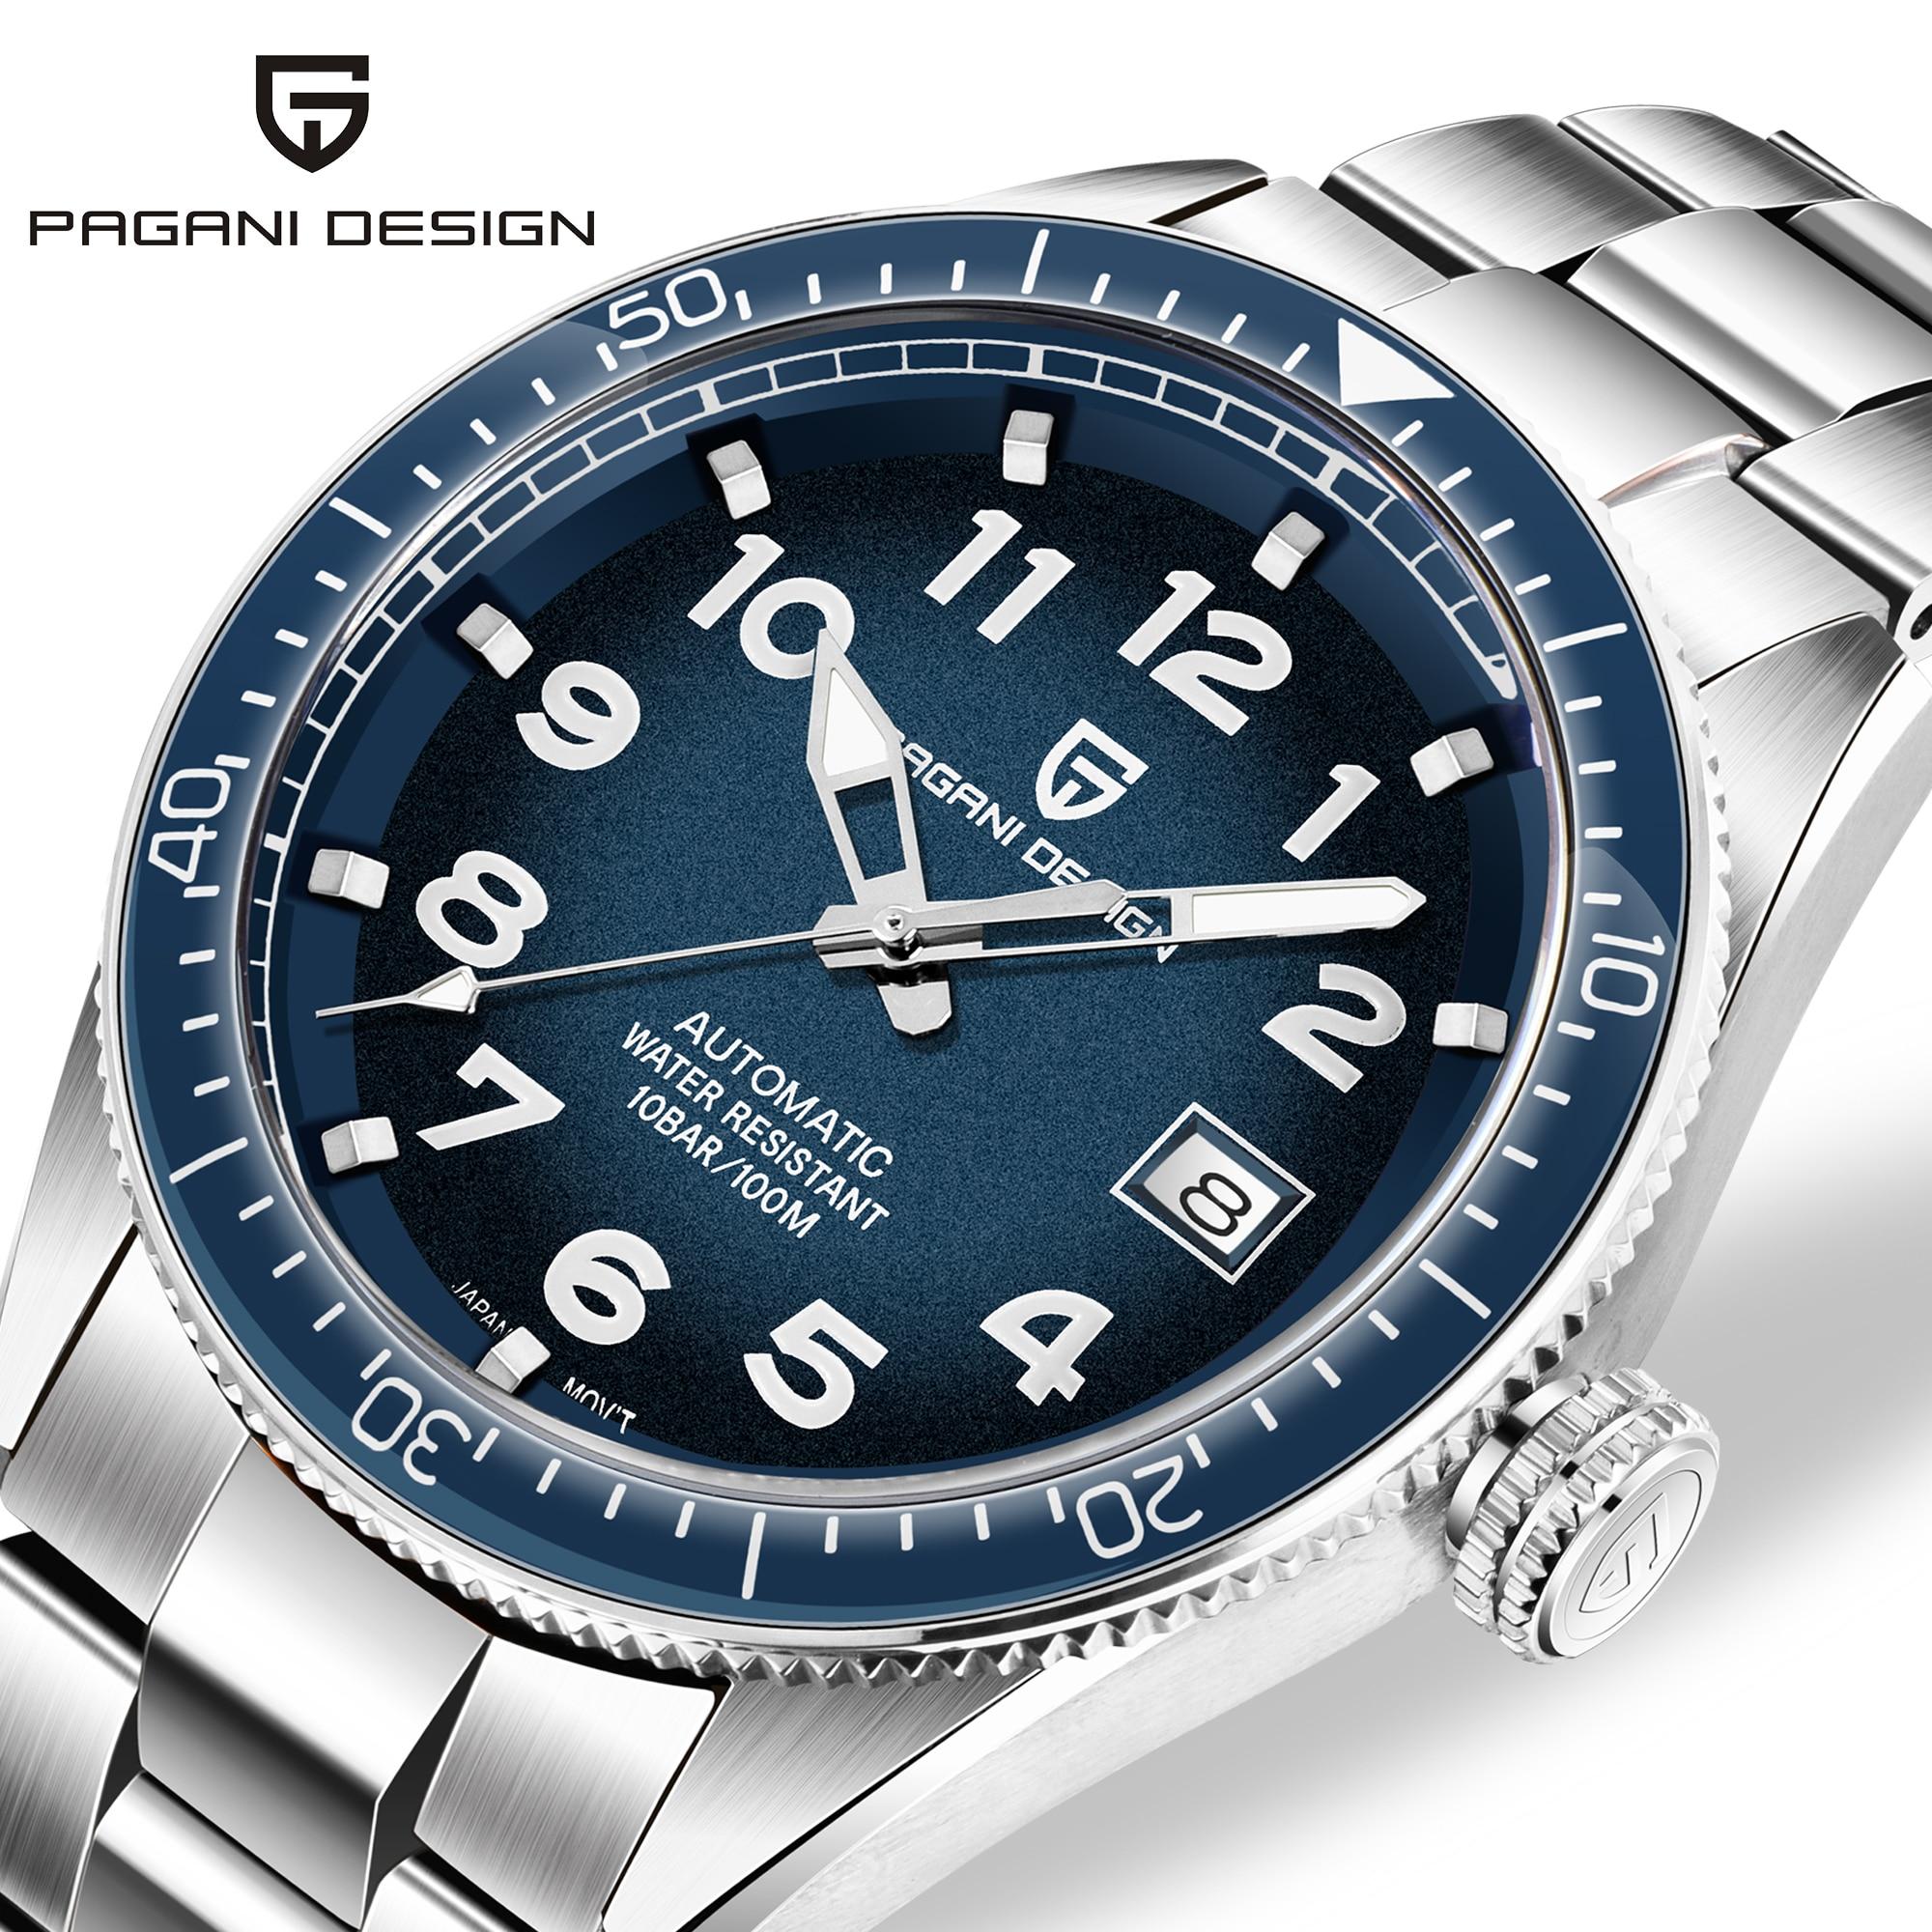 PAGANI DESIGN Men's Watches Brand Luxury Wristwatch Automatic Mechanical Watch Men Business Waterproof Watch Relojes Hombre 2019